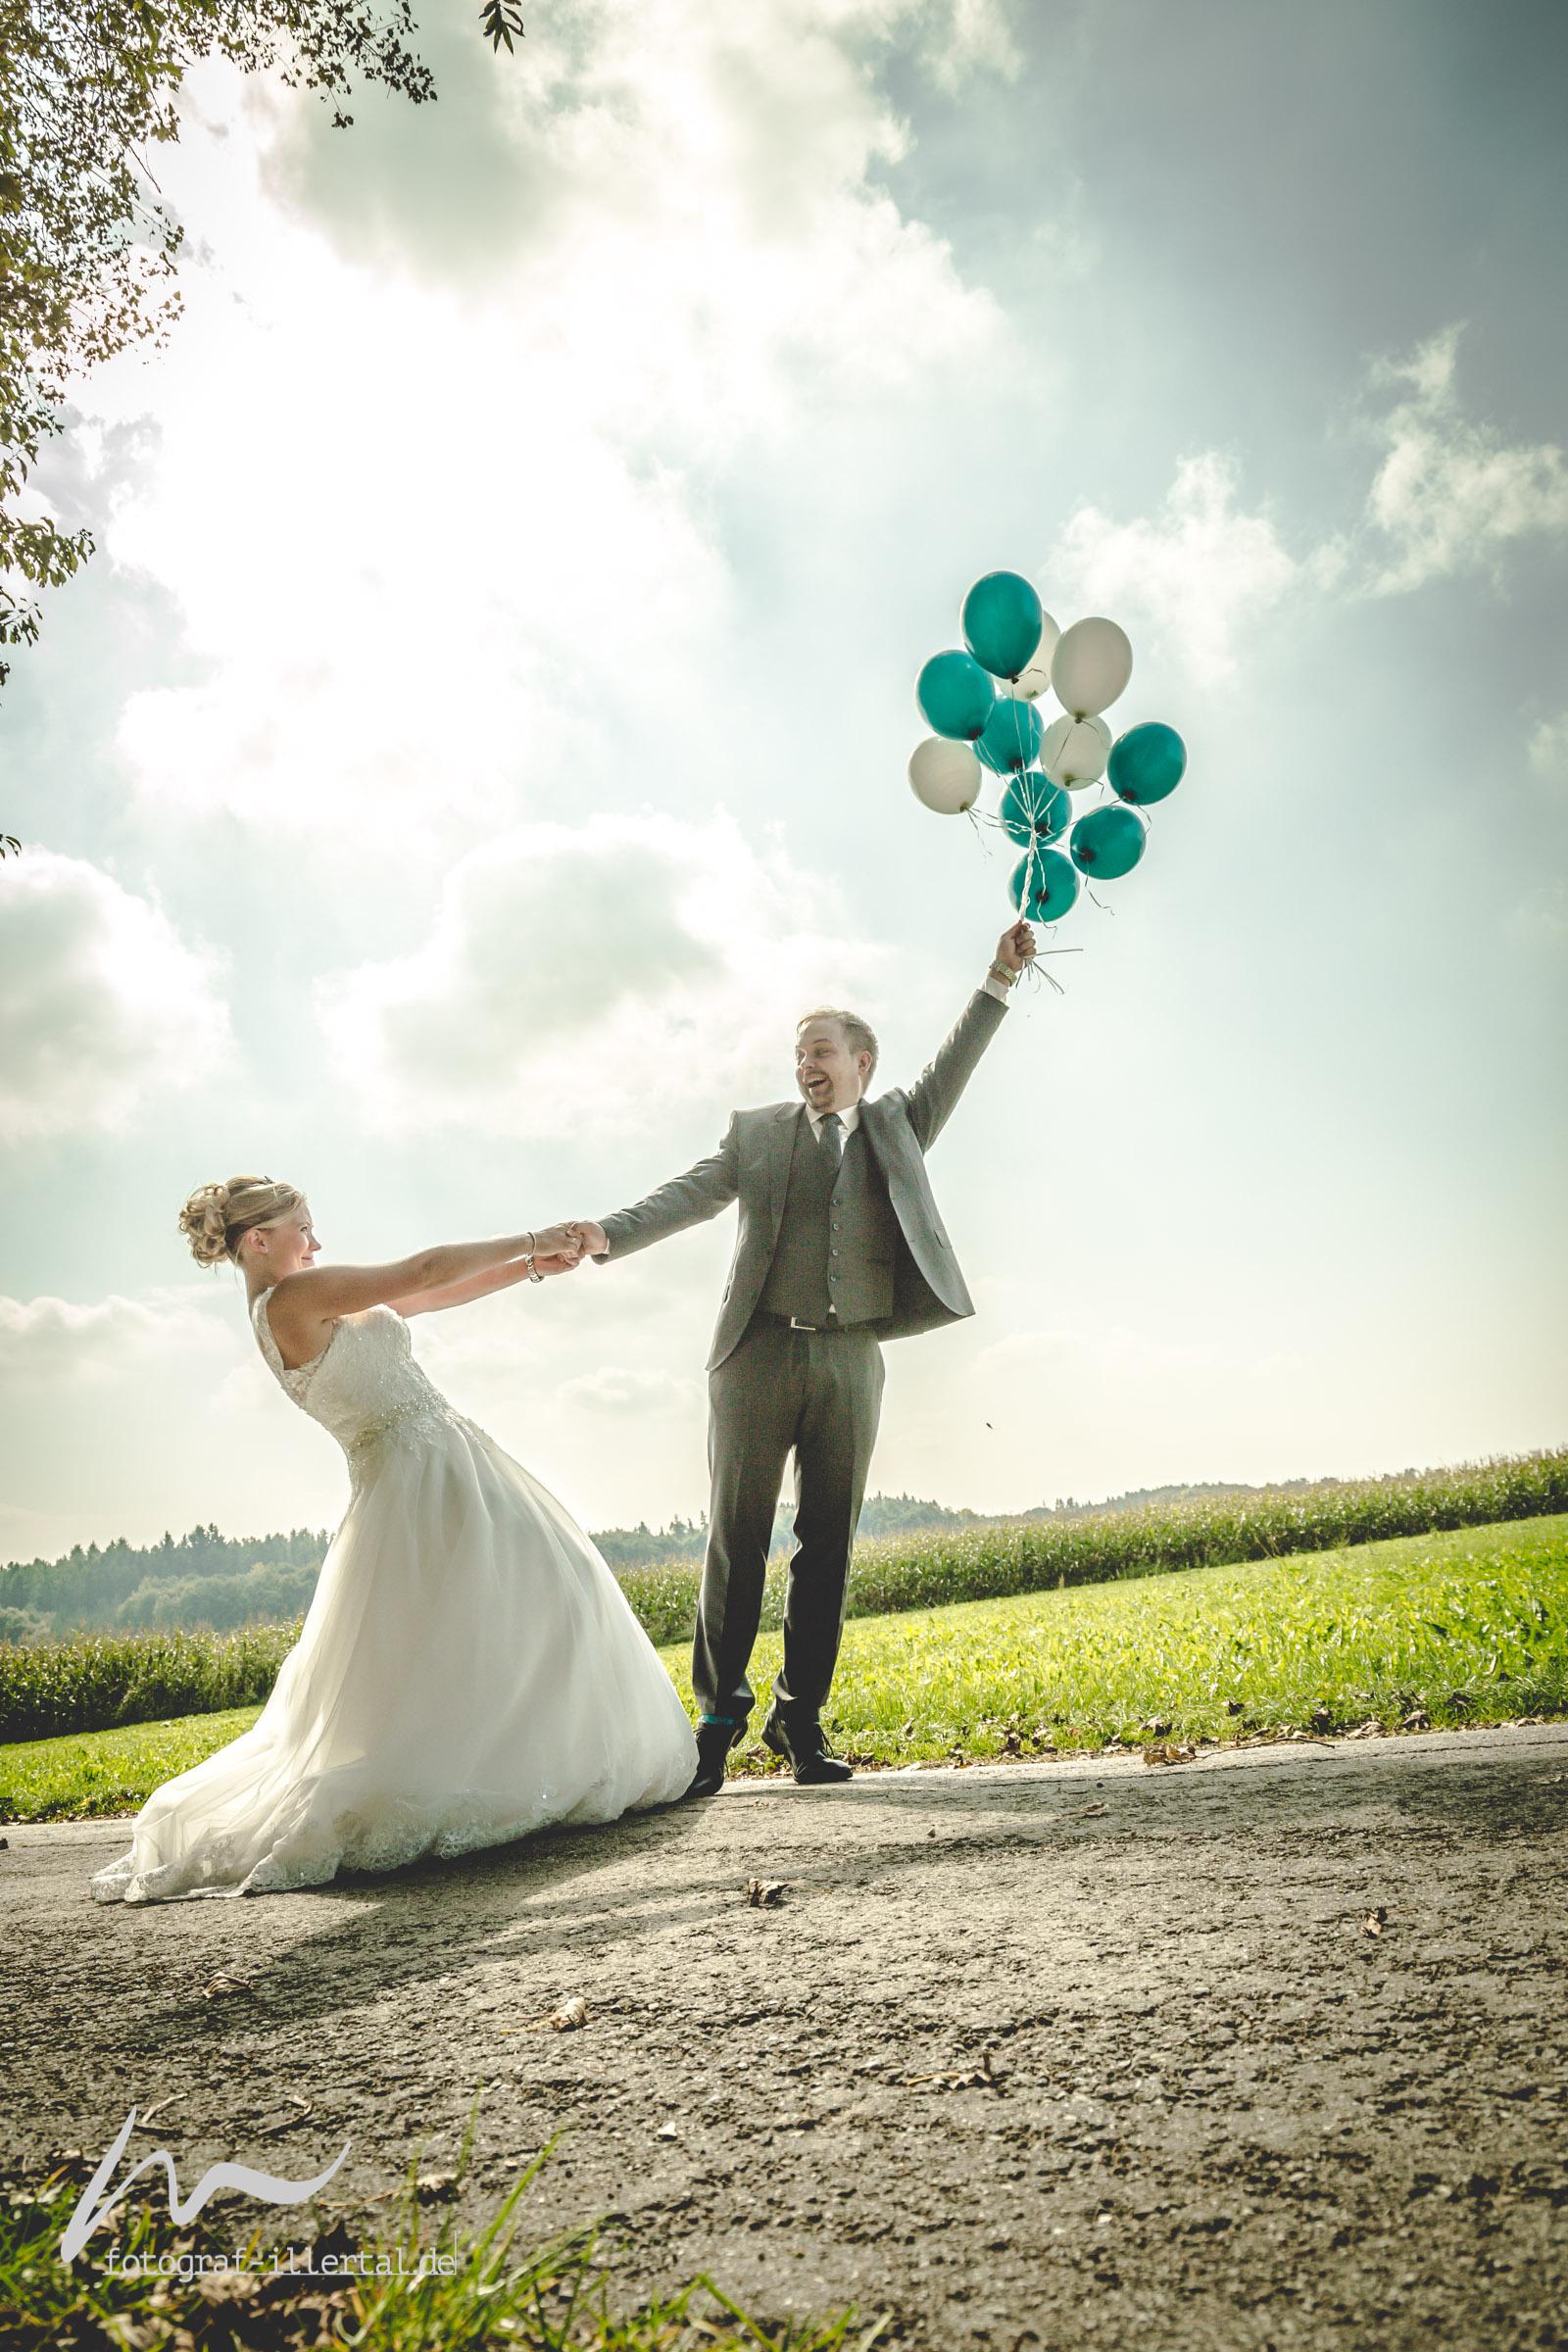 Fotograf Illertal-Christian Miller-Hochzeitsfotografie-_MG_8811